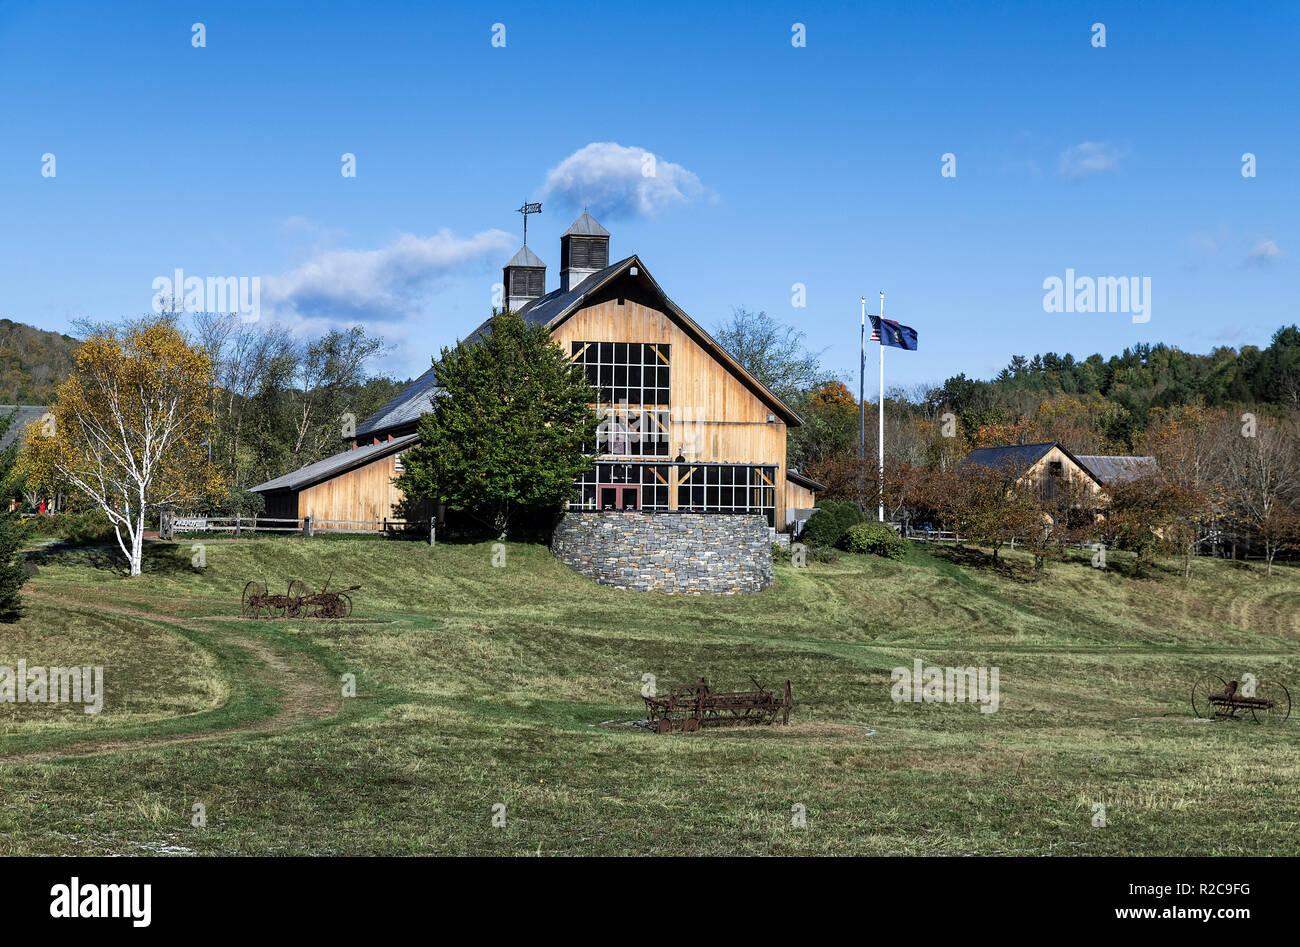 Vermont visitor information center, North Bernardston, Vermont, USA. - Stock Image